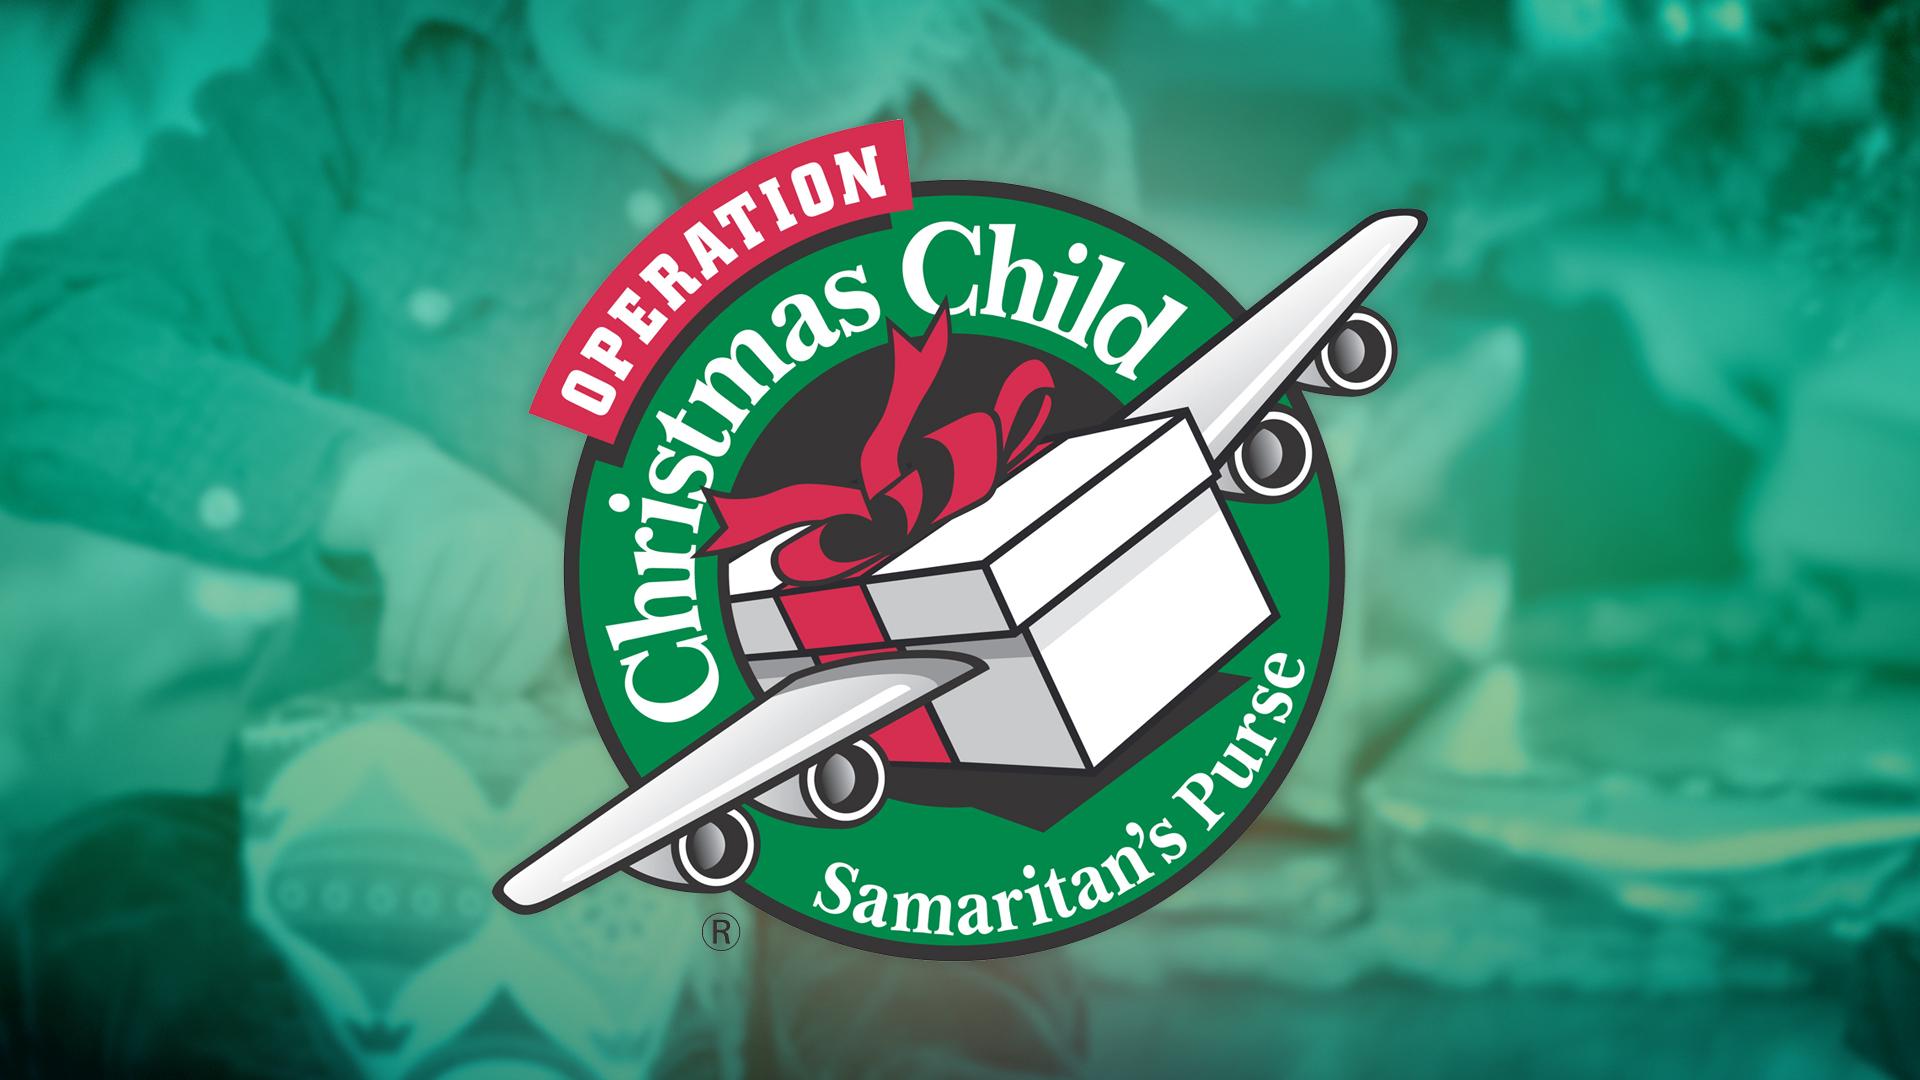 OP Christmas Child Title.jpg